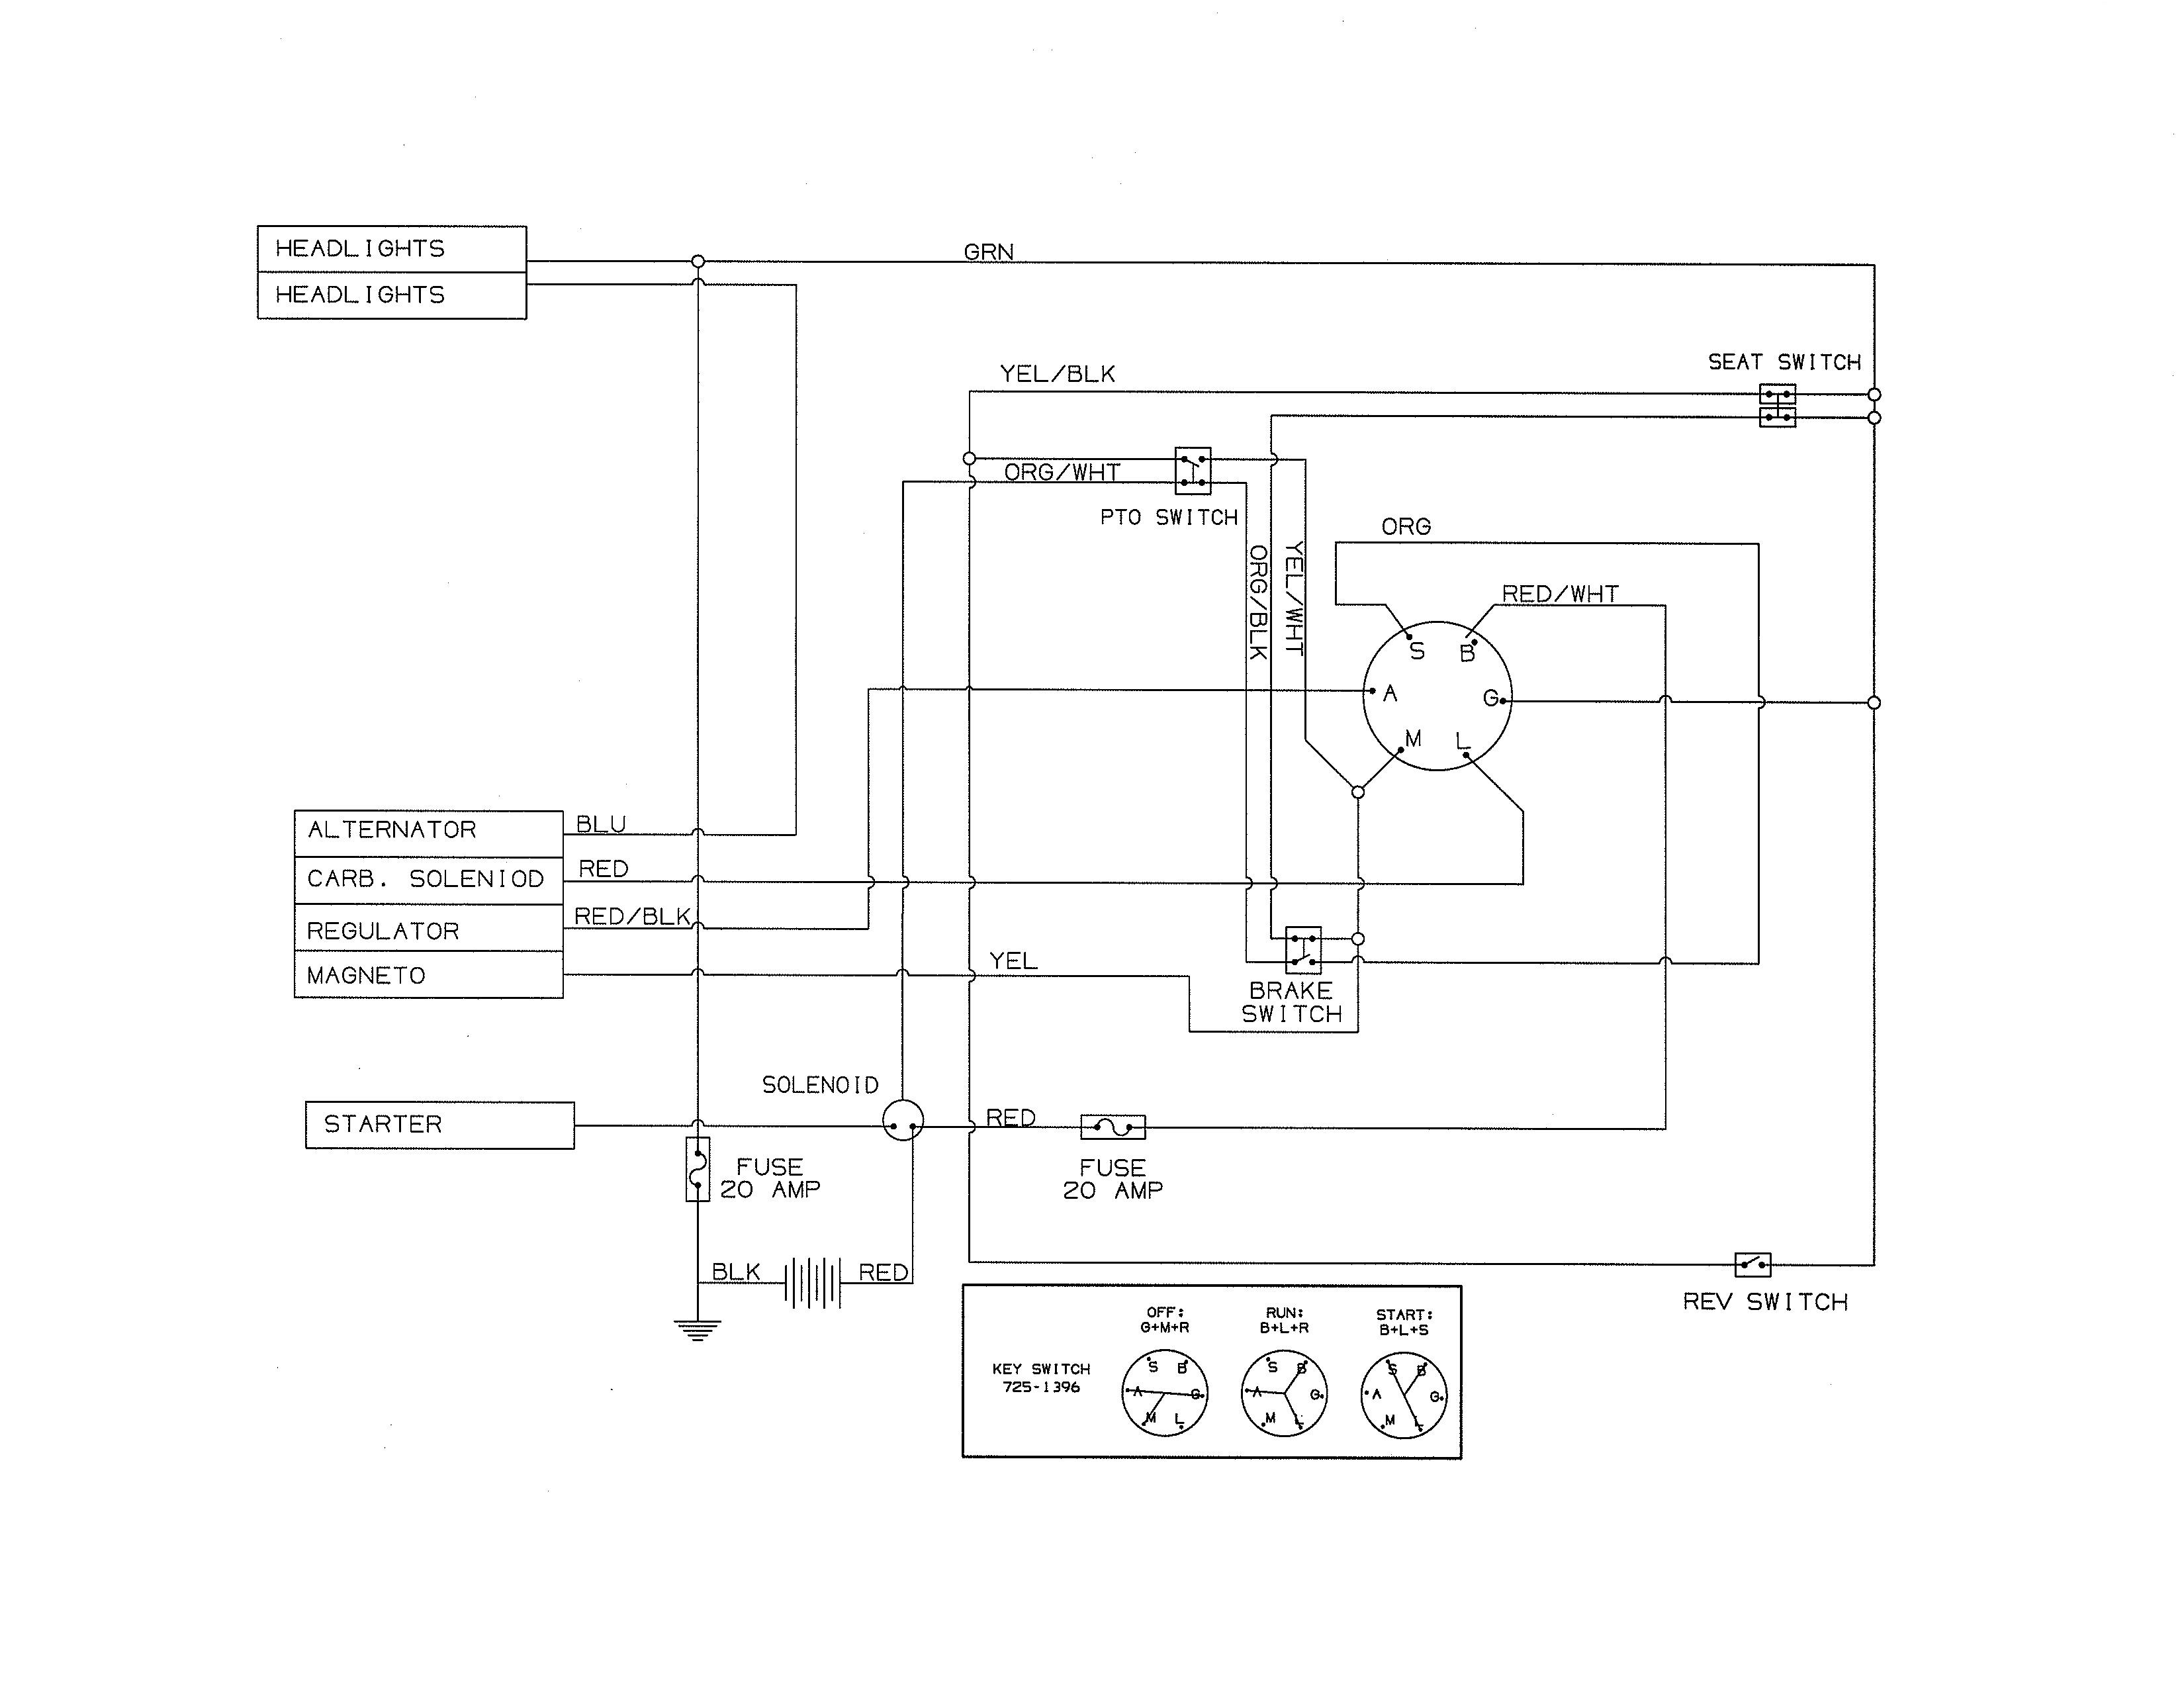 mtd wiring diagram manual wiring diagram mtd fuses diagram wiring diagram technicmtd wiring schematics parts manual